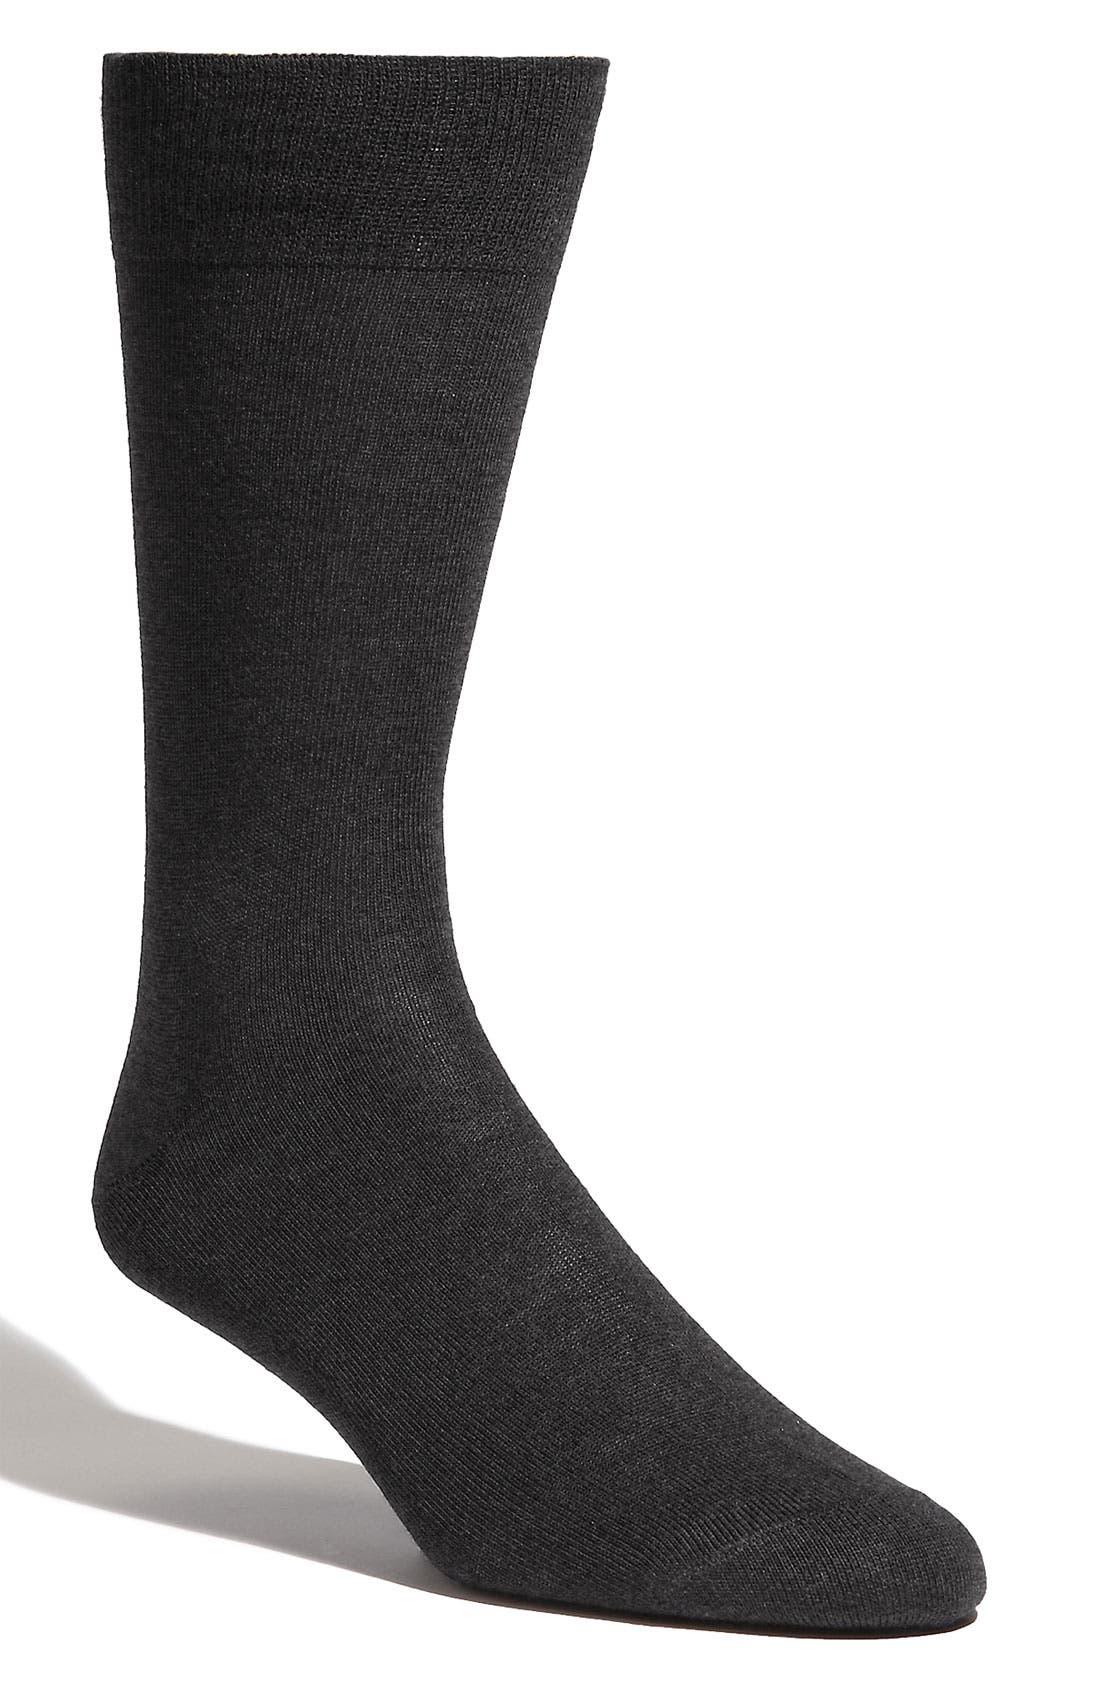 Lorenzo Uomo Merino Wool Blend Socks (Men) (3 for $30)